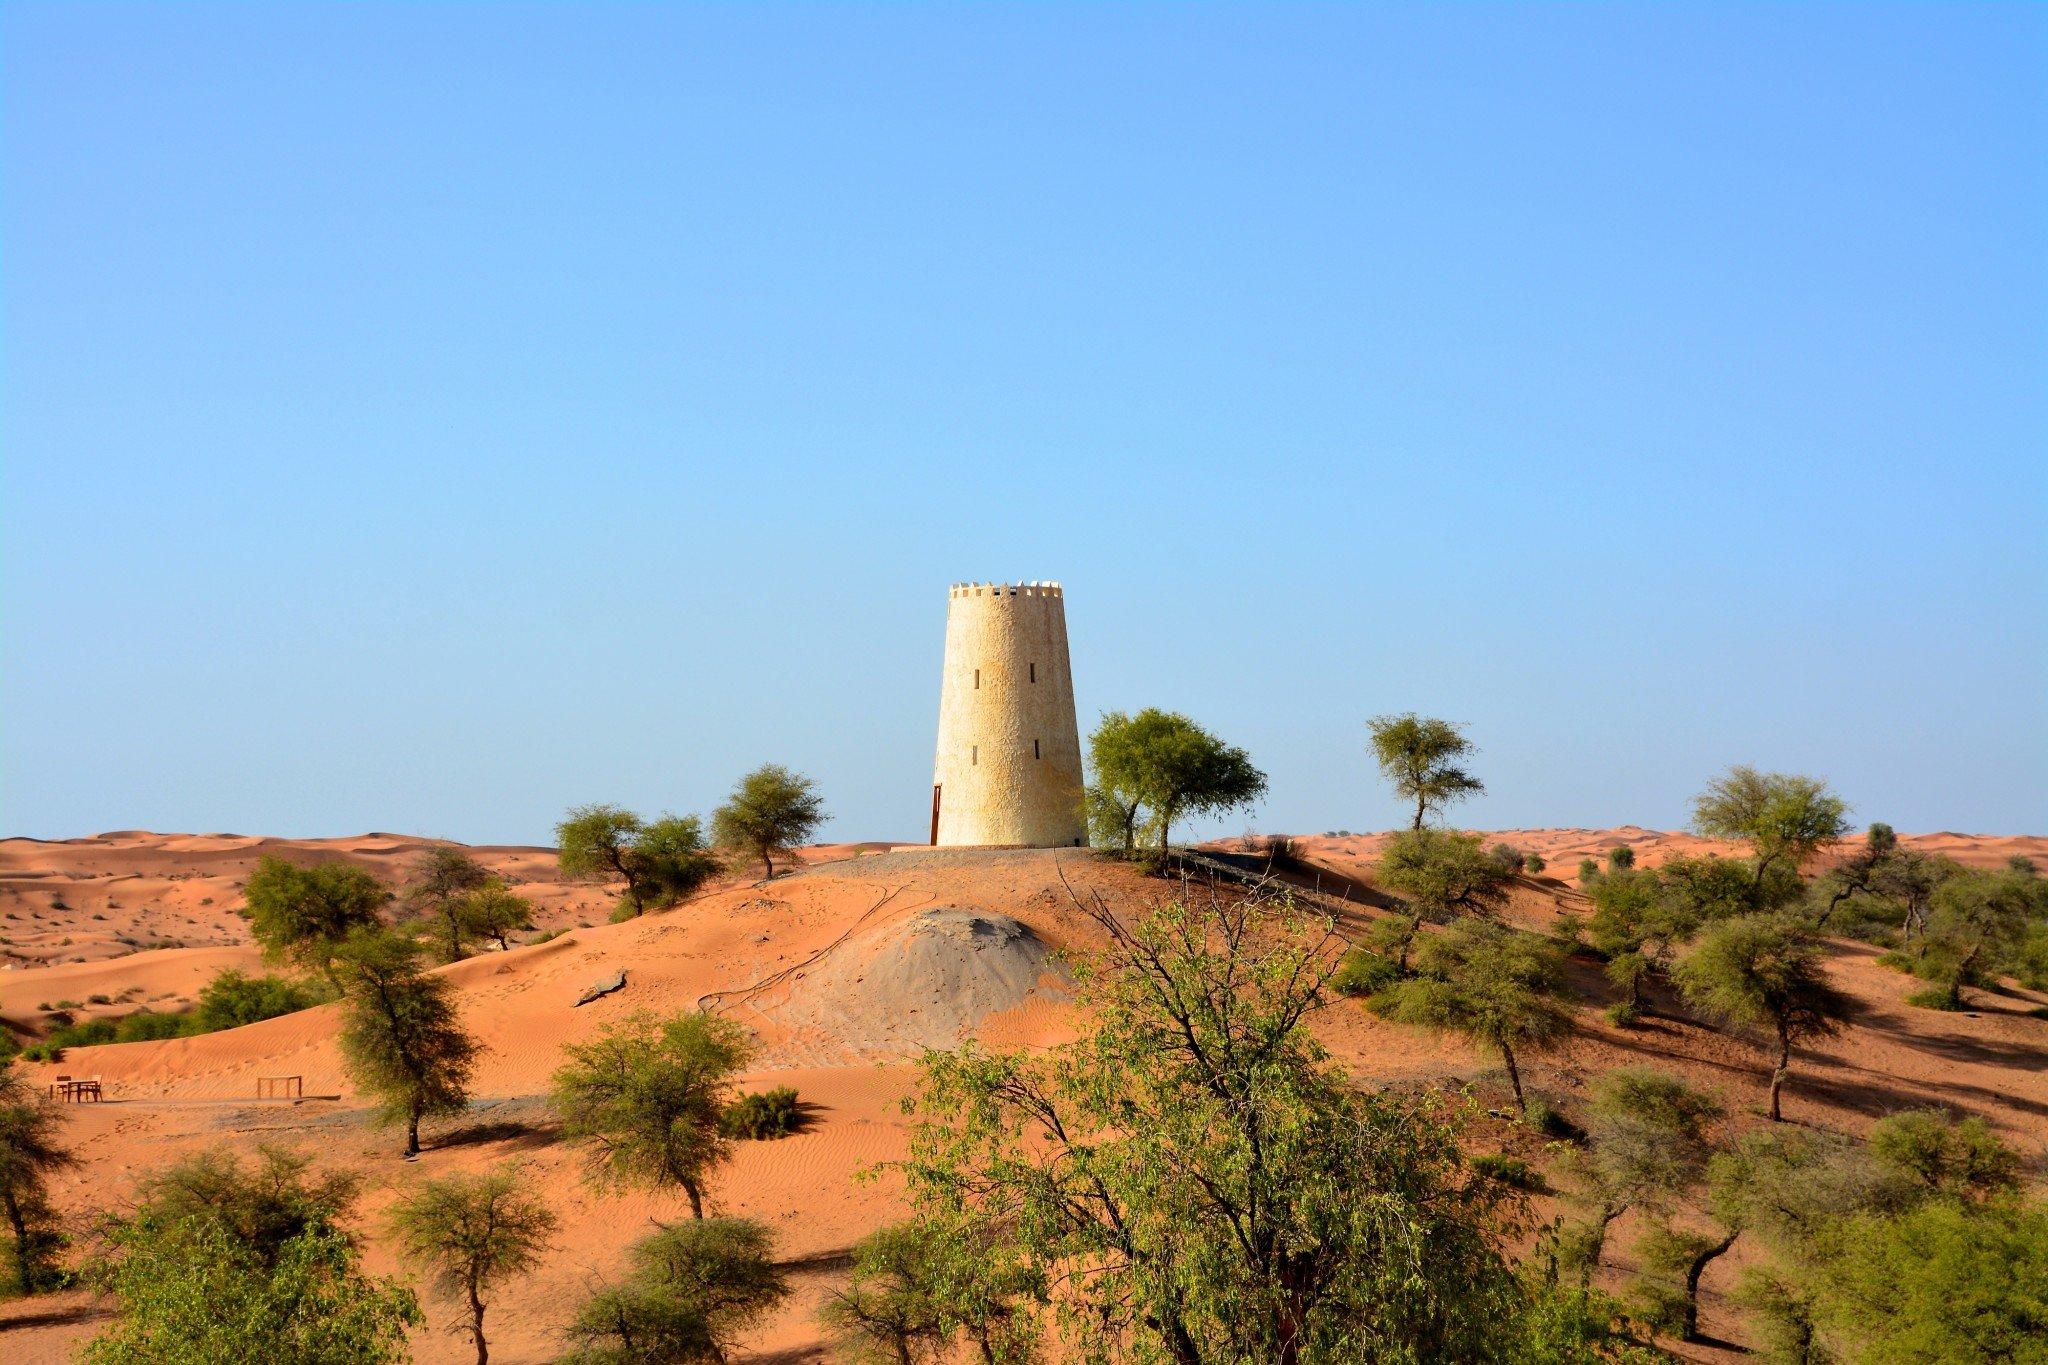 Banyan Tree tower